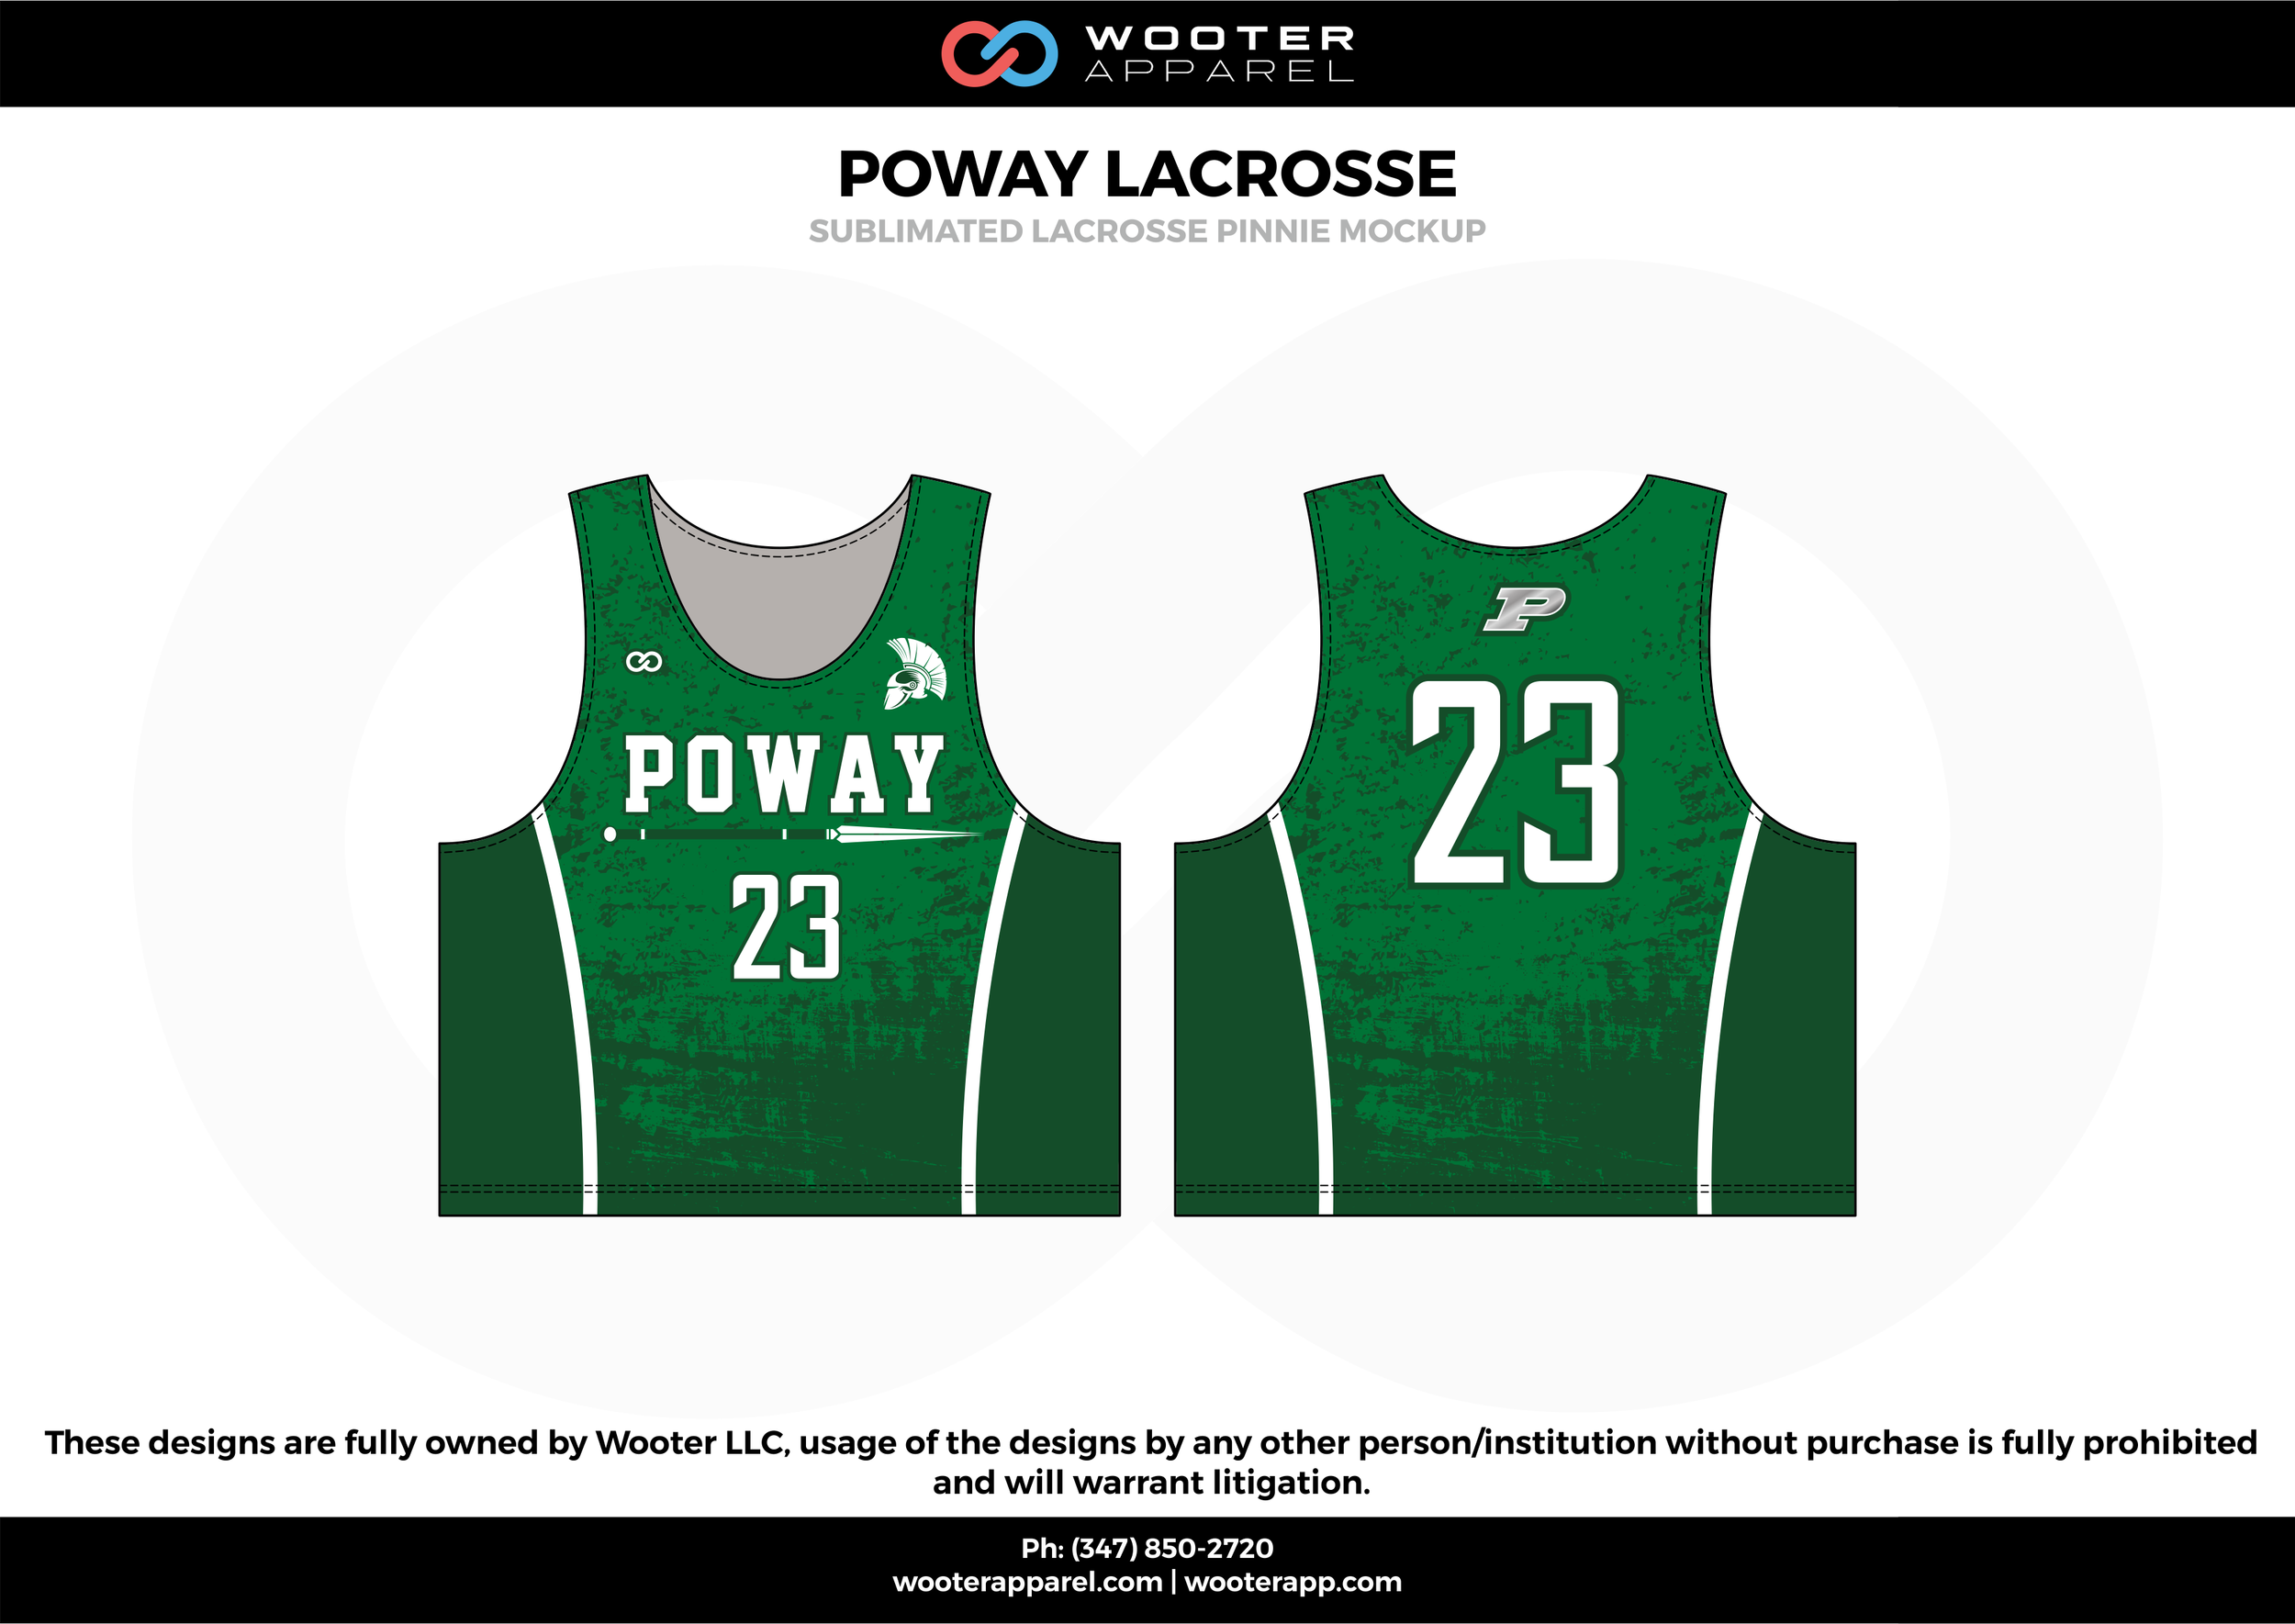 POWAY LACROSSE green and white Lacrosse uniforms reversible pinnies jerseys